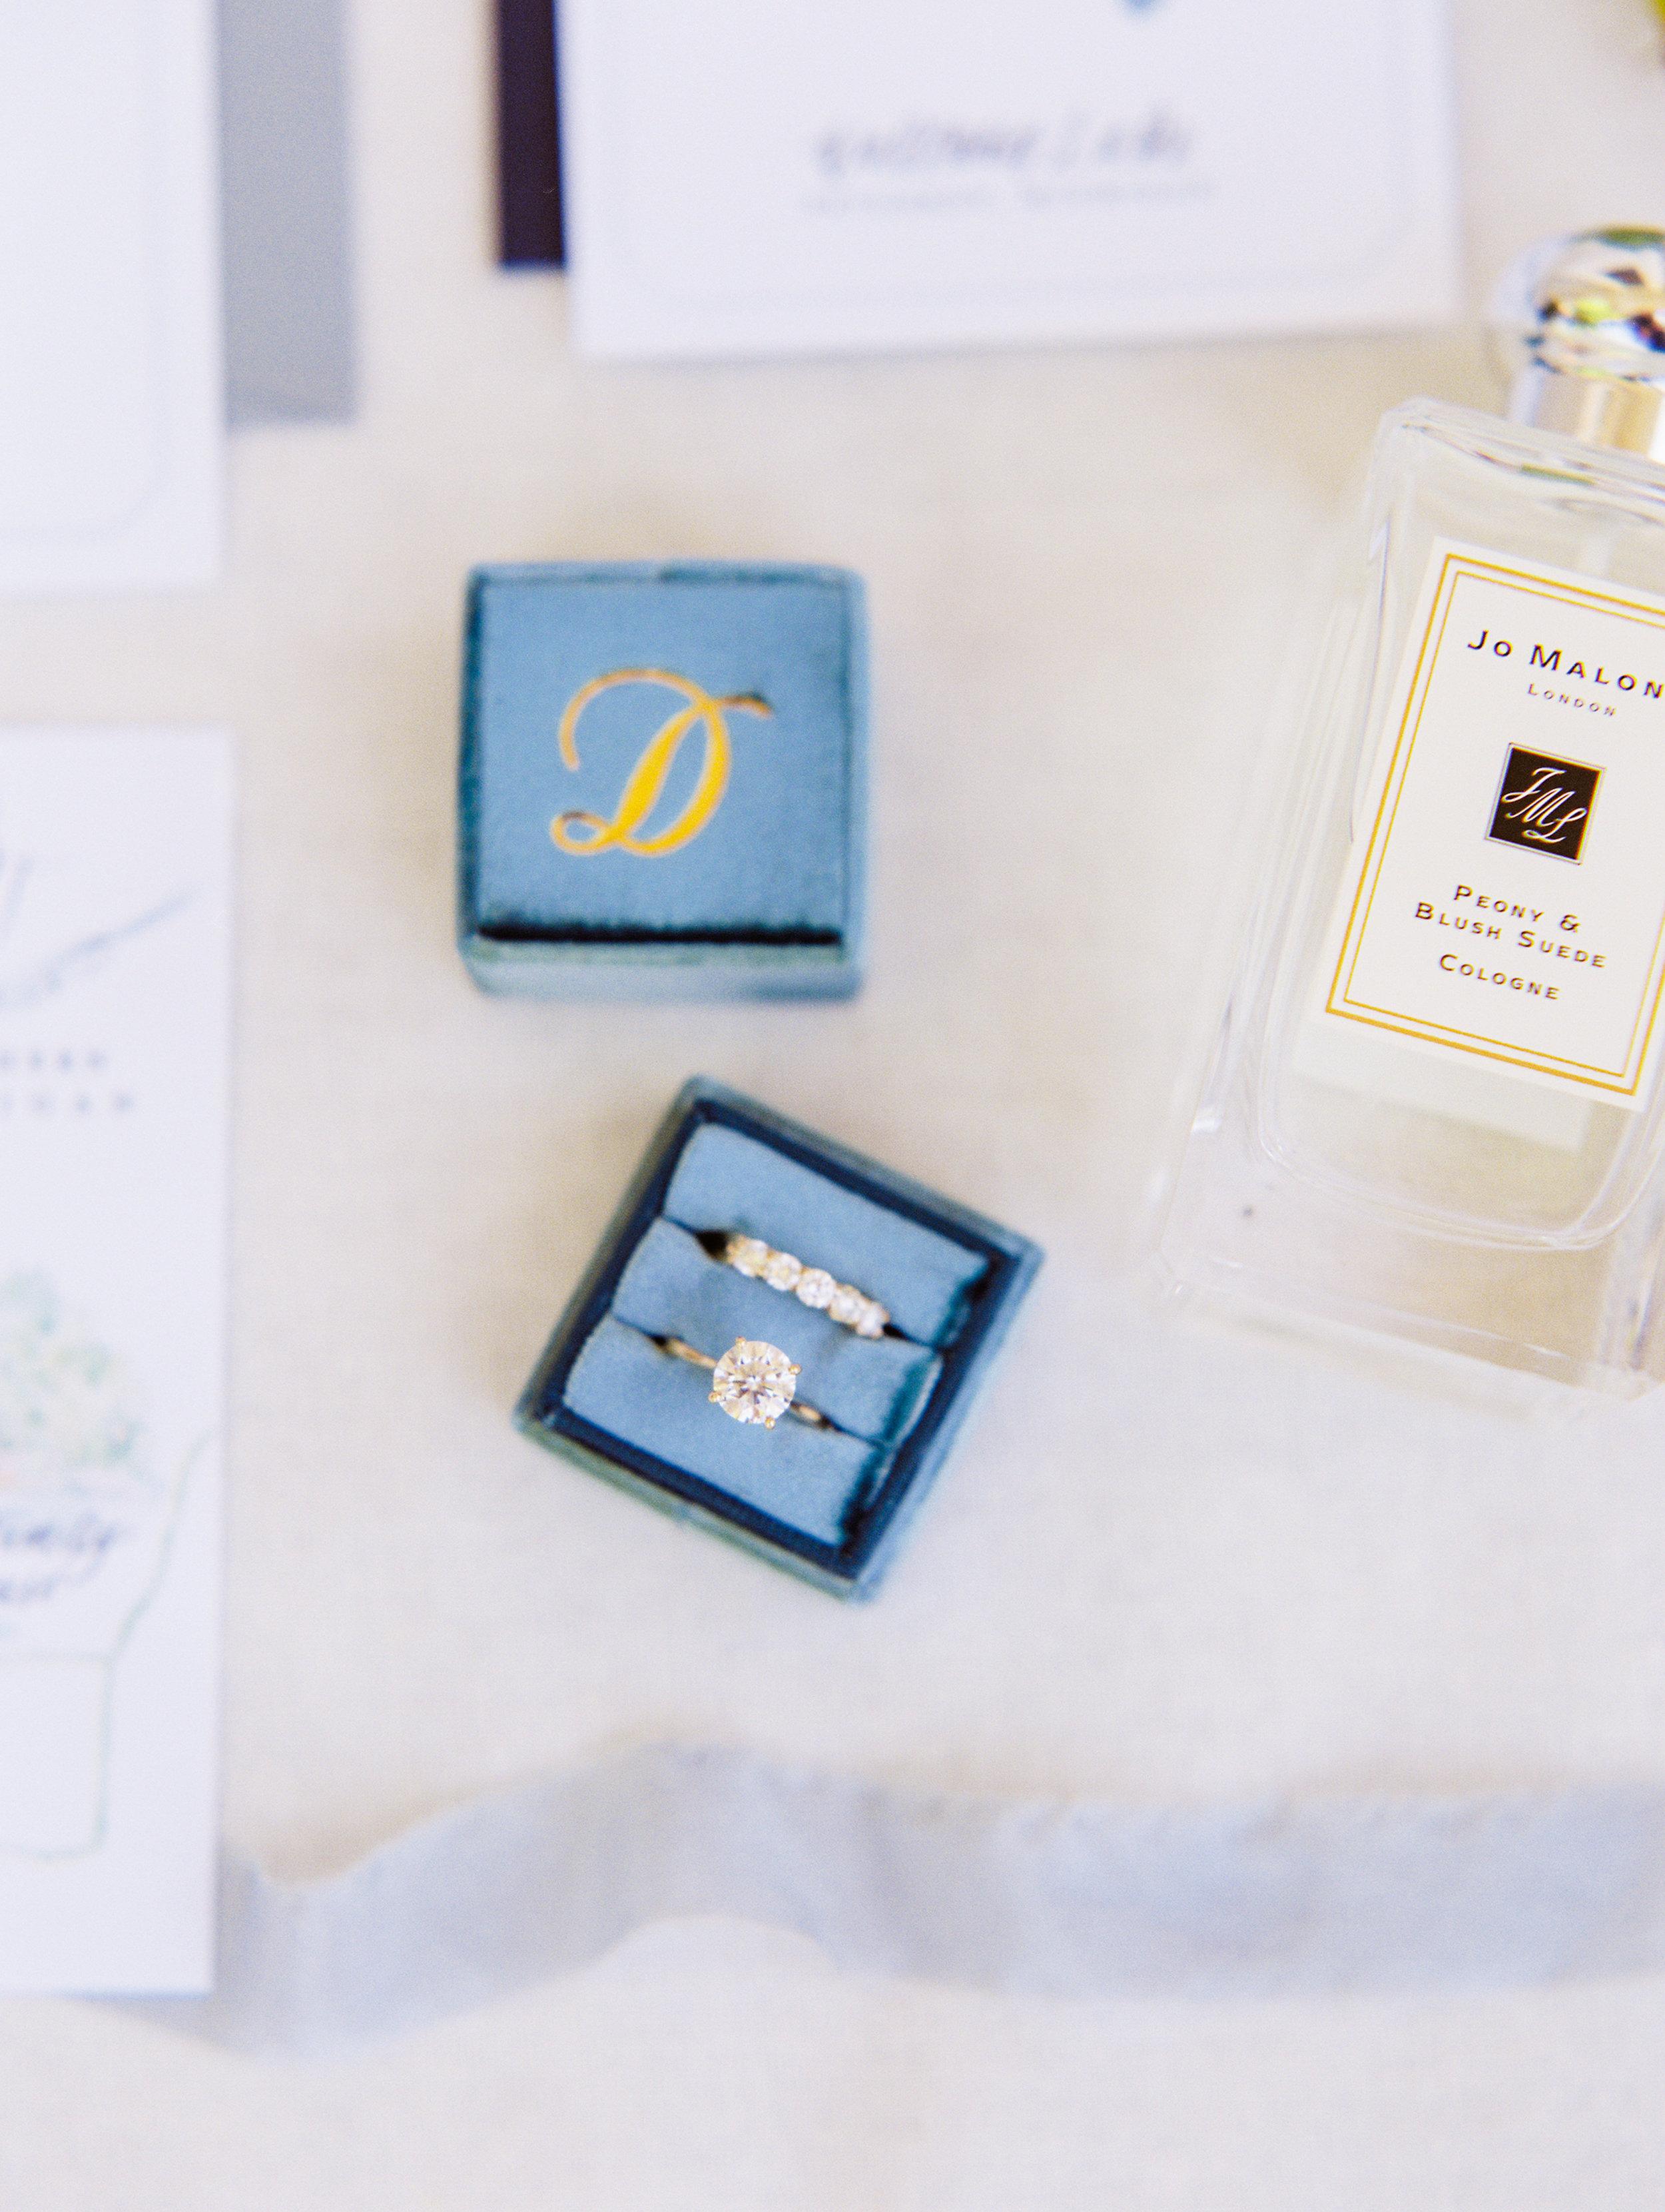 DeGuilio+Wedding+Detailsf-22 copy.jpg